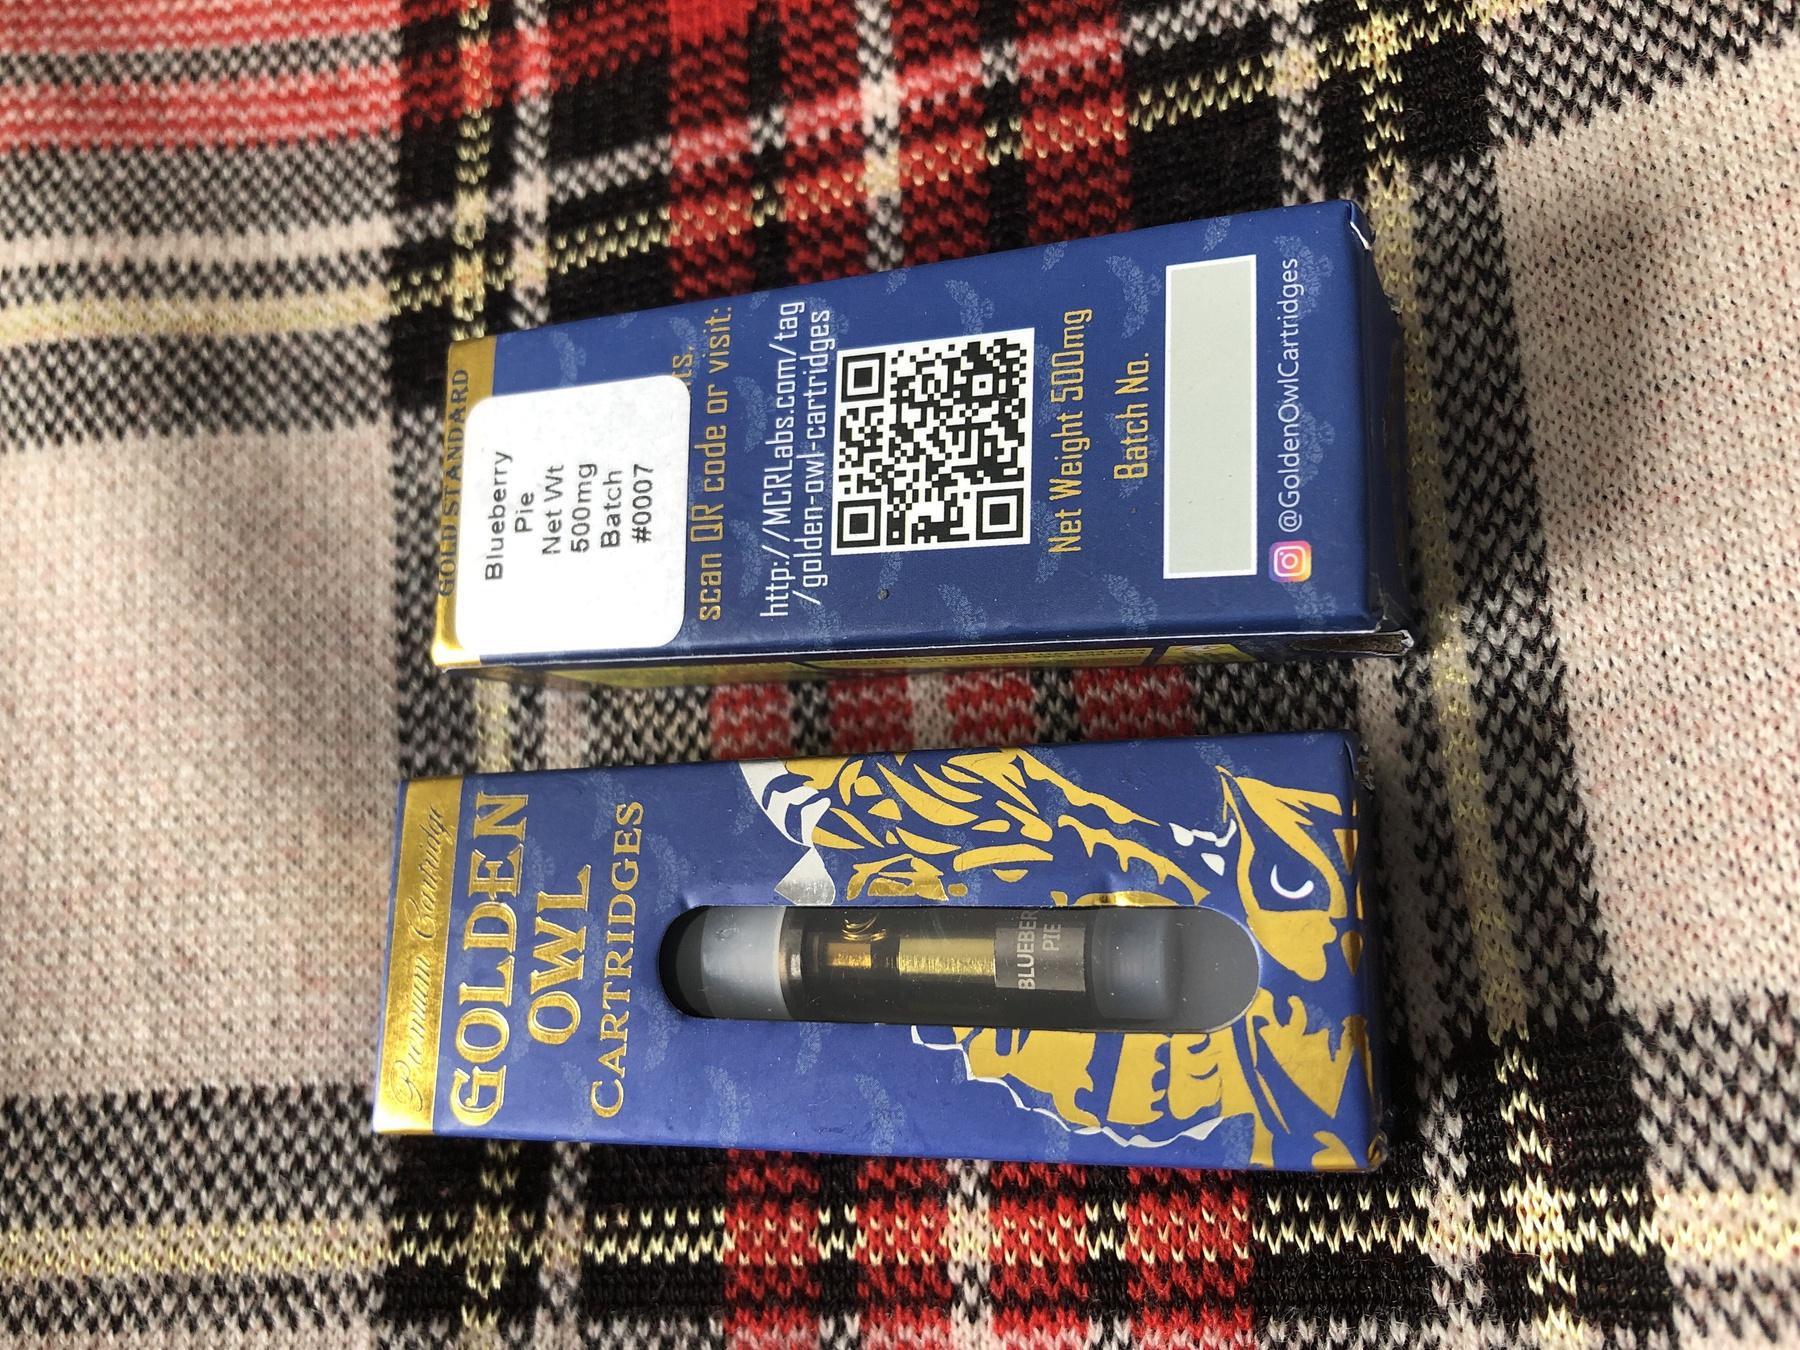 BlueBerry Pie 0.5 Cartridge (Golden Owl) Product image